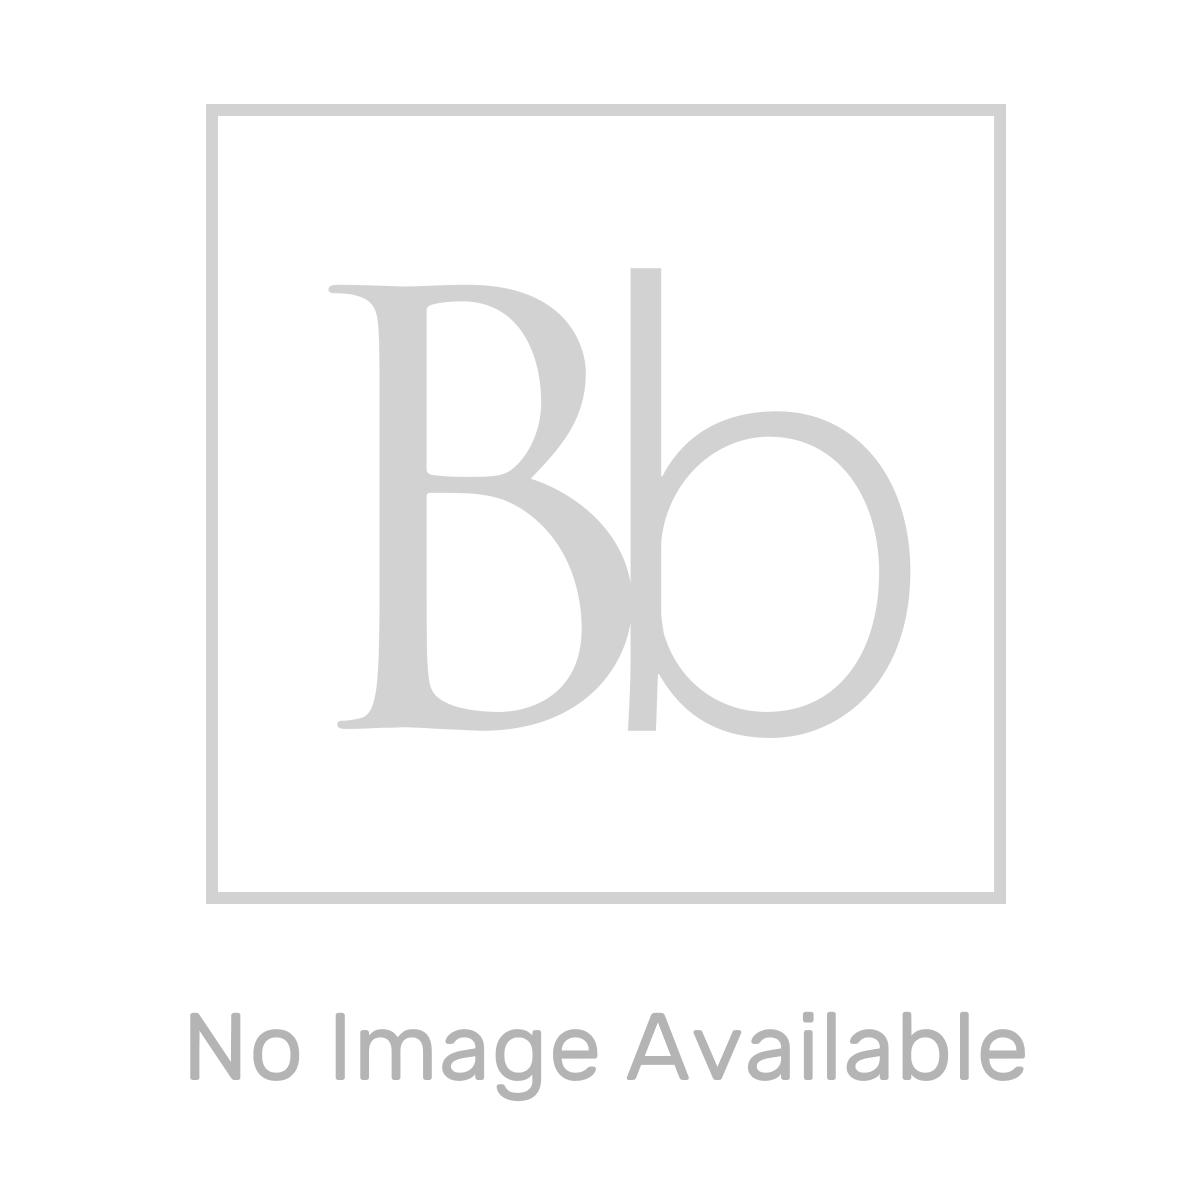 Nuie Athena Stone Grey 2 Door Floor Standing Vanity Unit with 50mm Profile Basin 500mm Line Drawing